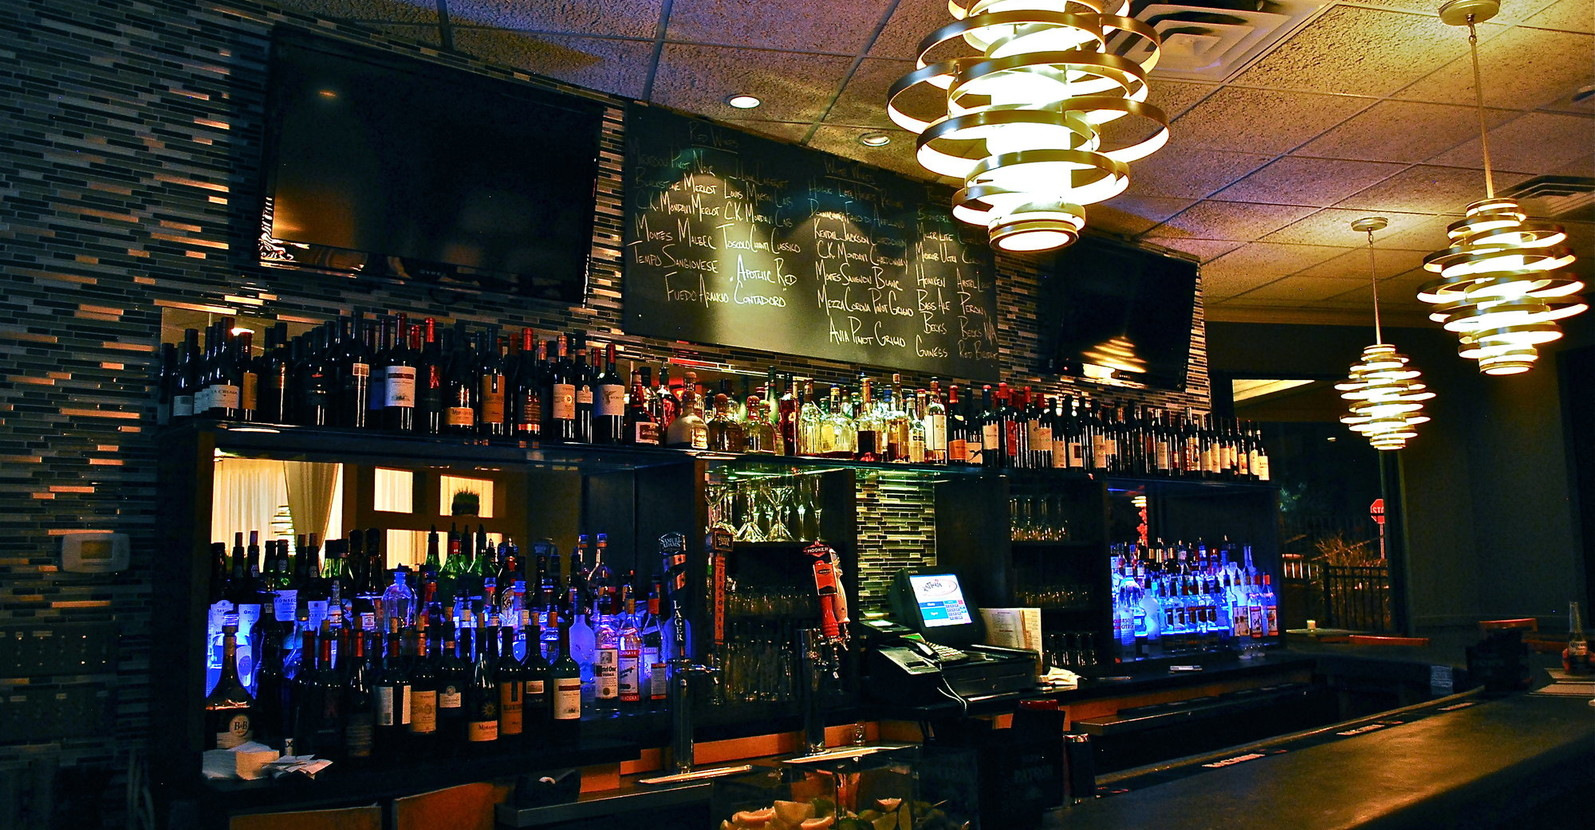 Best Local Restaurant In Monroe